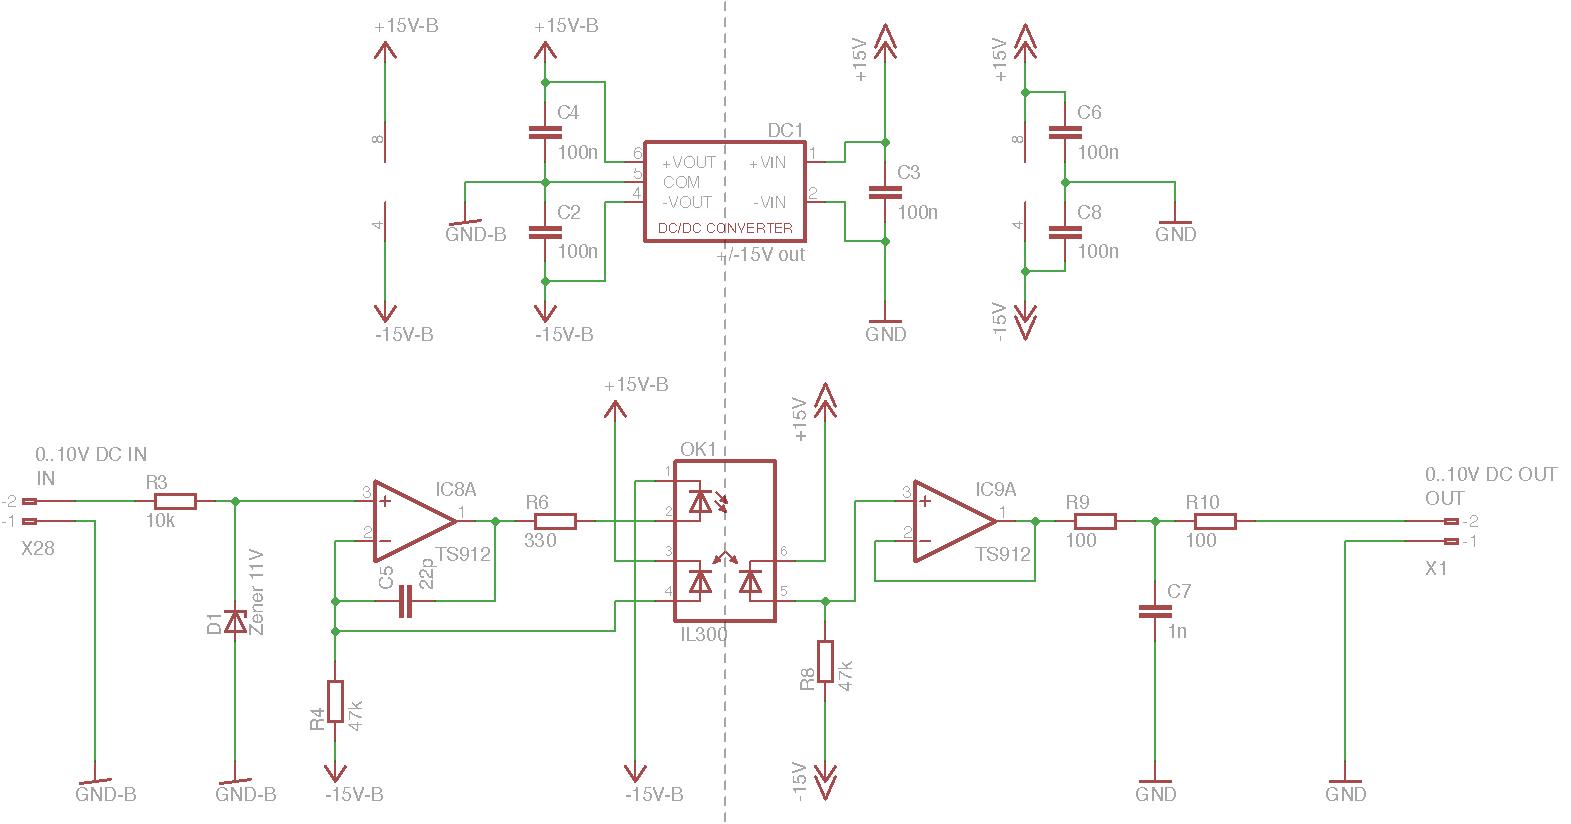 Wind-Sensor mit 4-20mA (1-5V) galvanisch trennen - Mikrocontroller.net